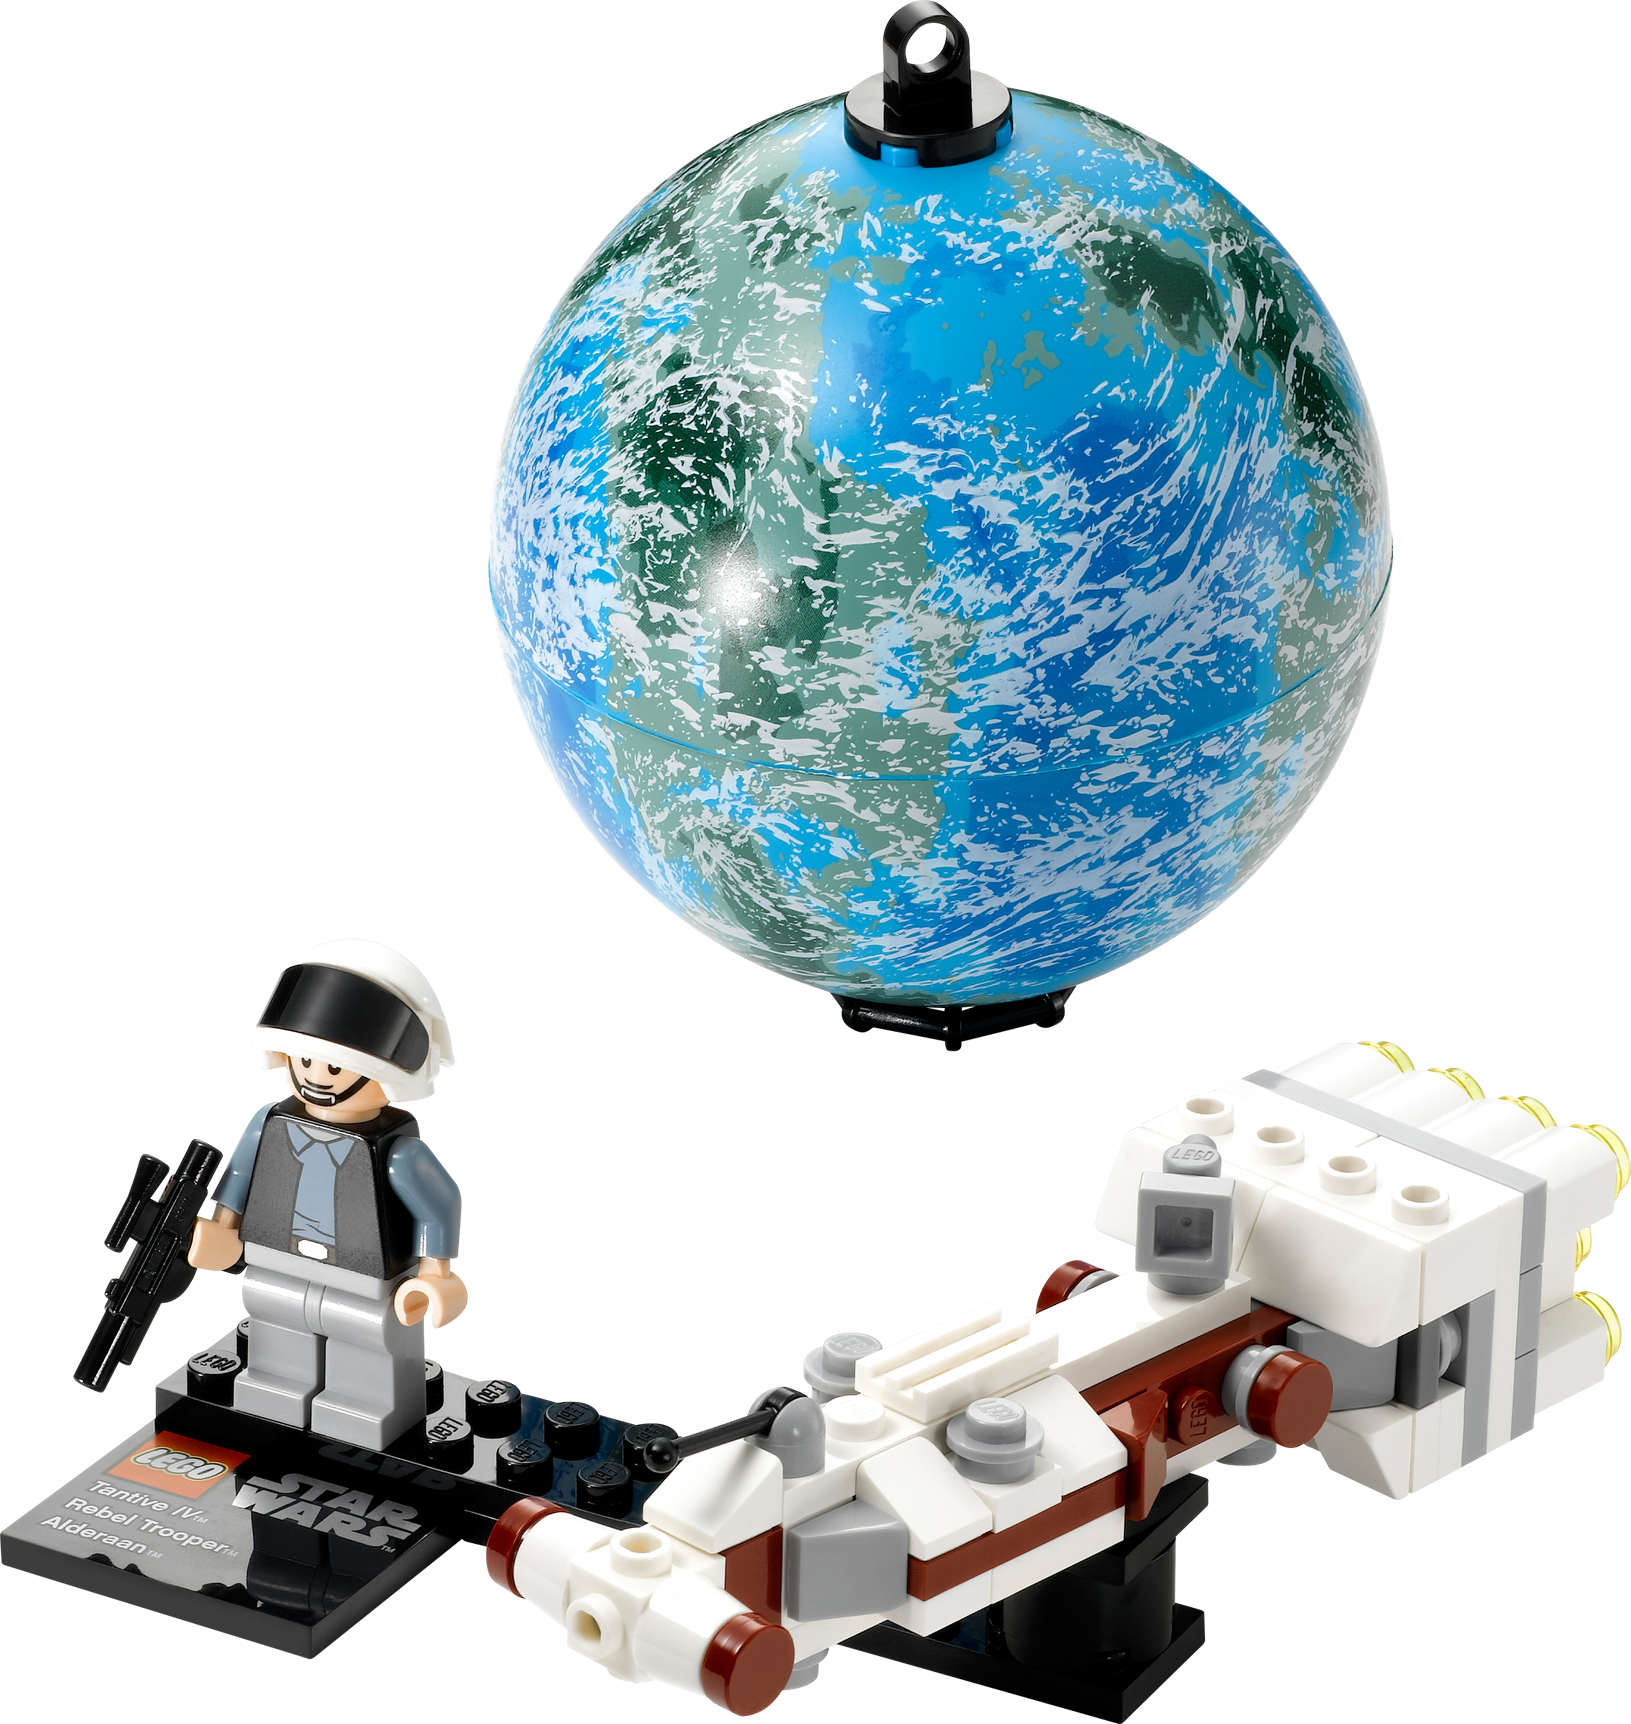 Tantive IV & Planet Alderaan